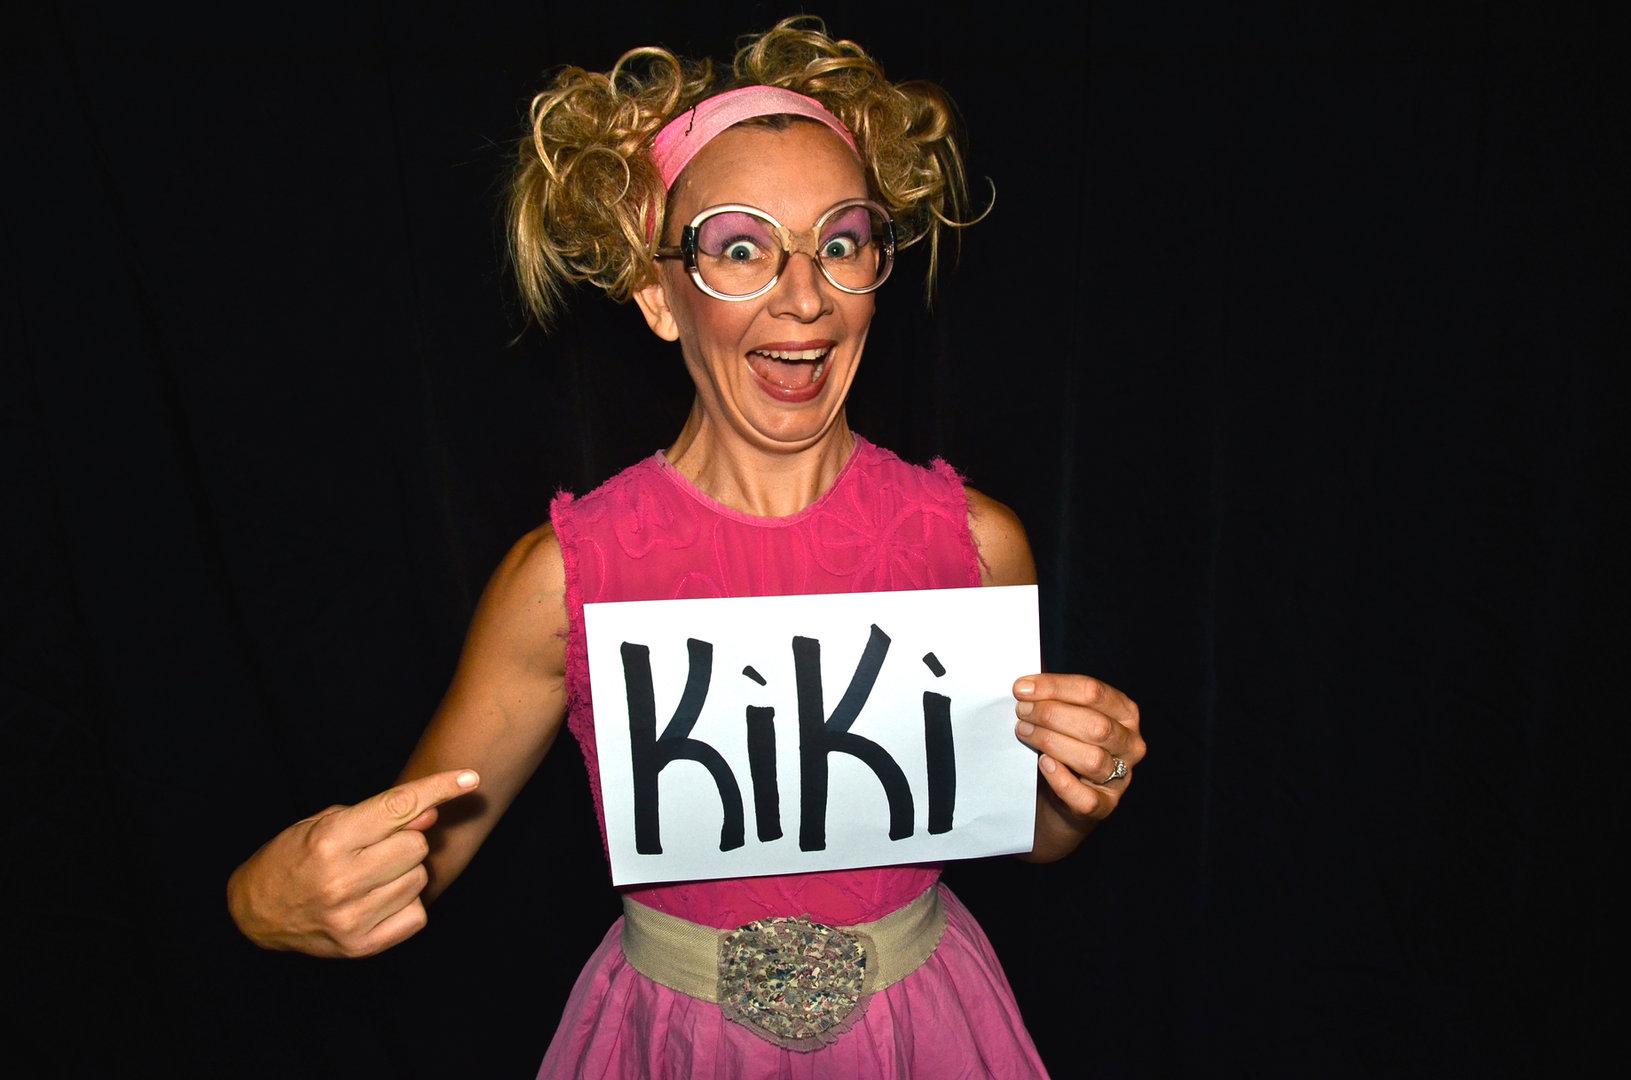 Kiki with sign.JPG